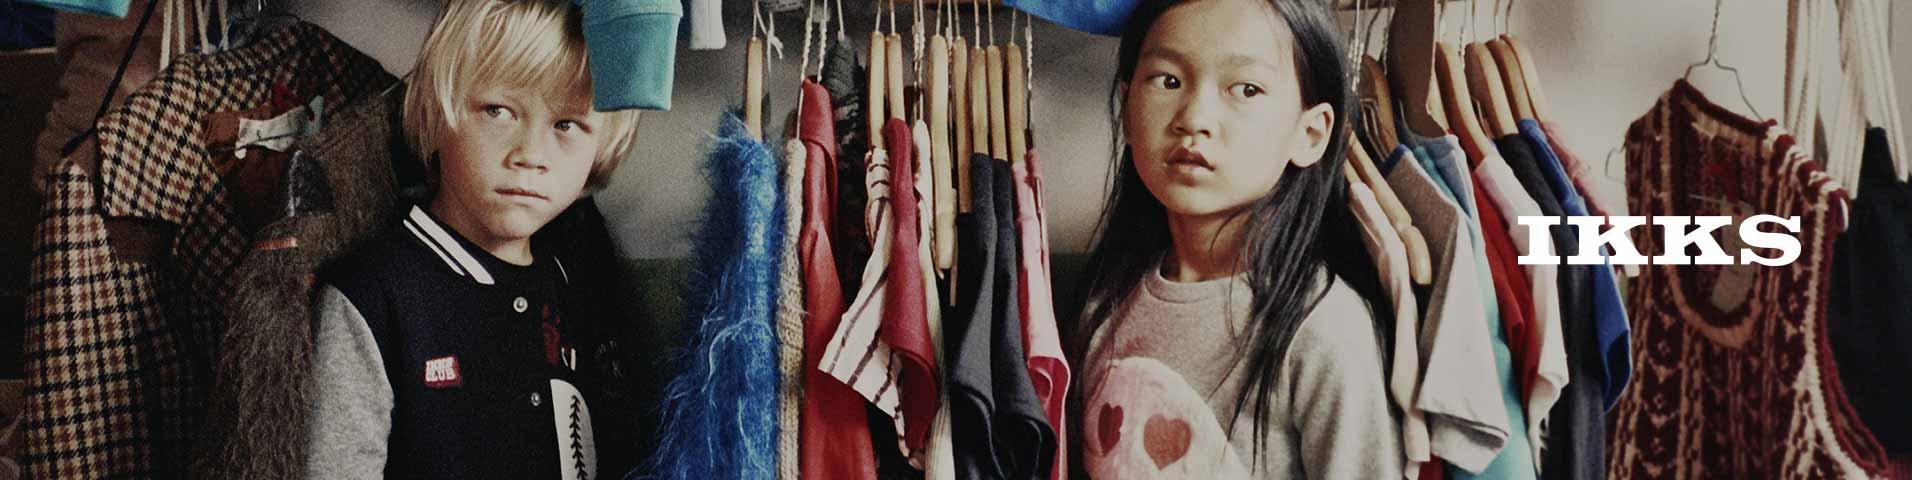 low cost 100% top quality lace up in Ropa IKKS para niños | Catálogo infantil online en Zalando